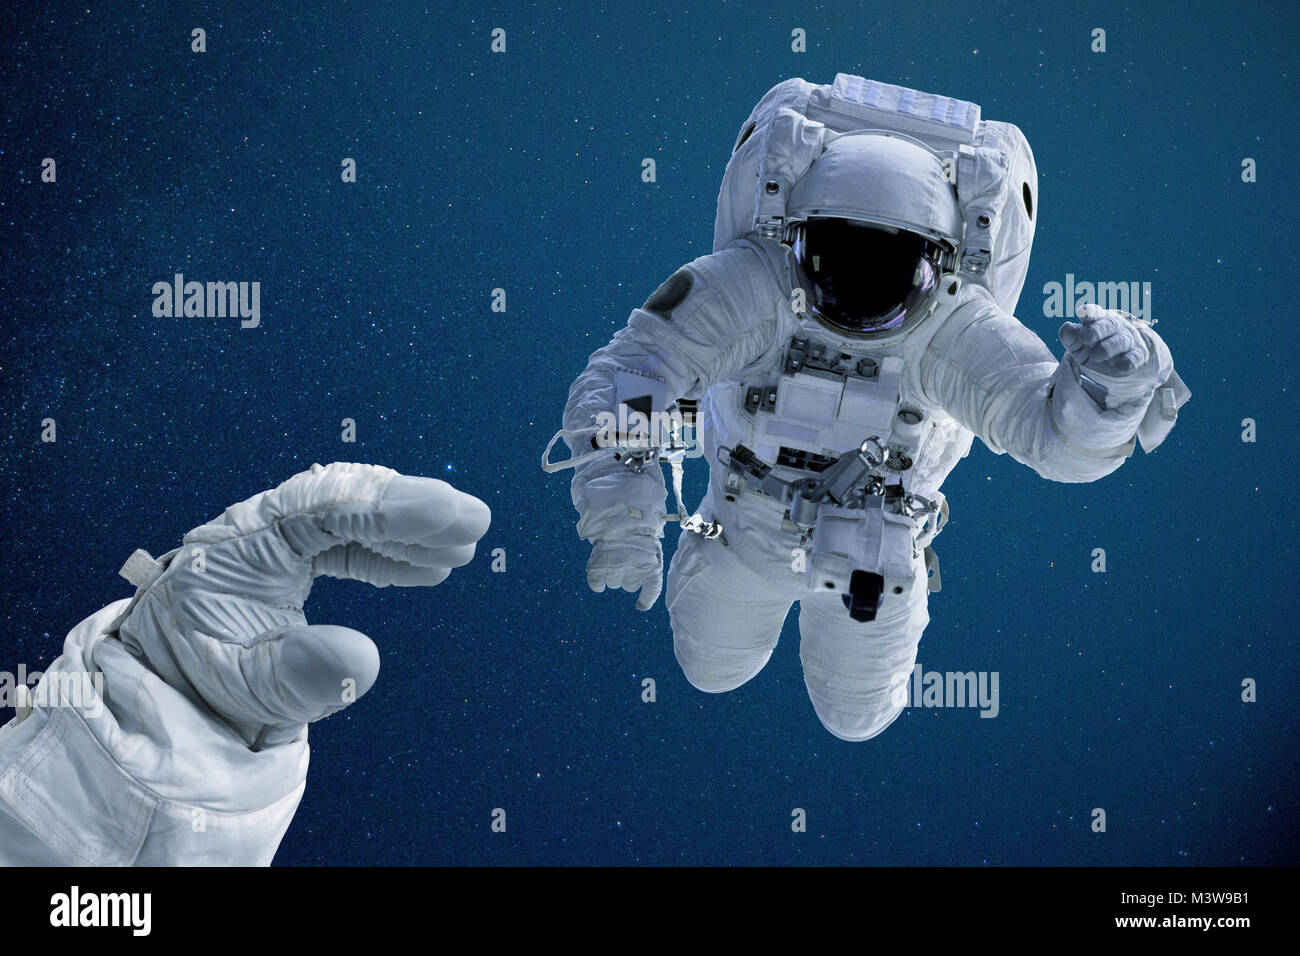 astronaut reaching space - photo #3